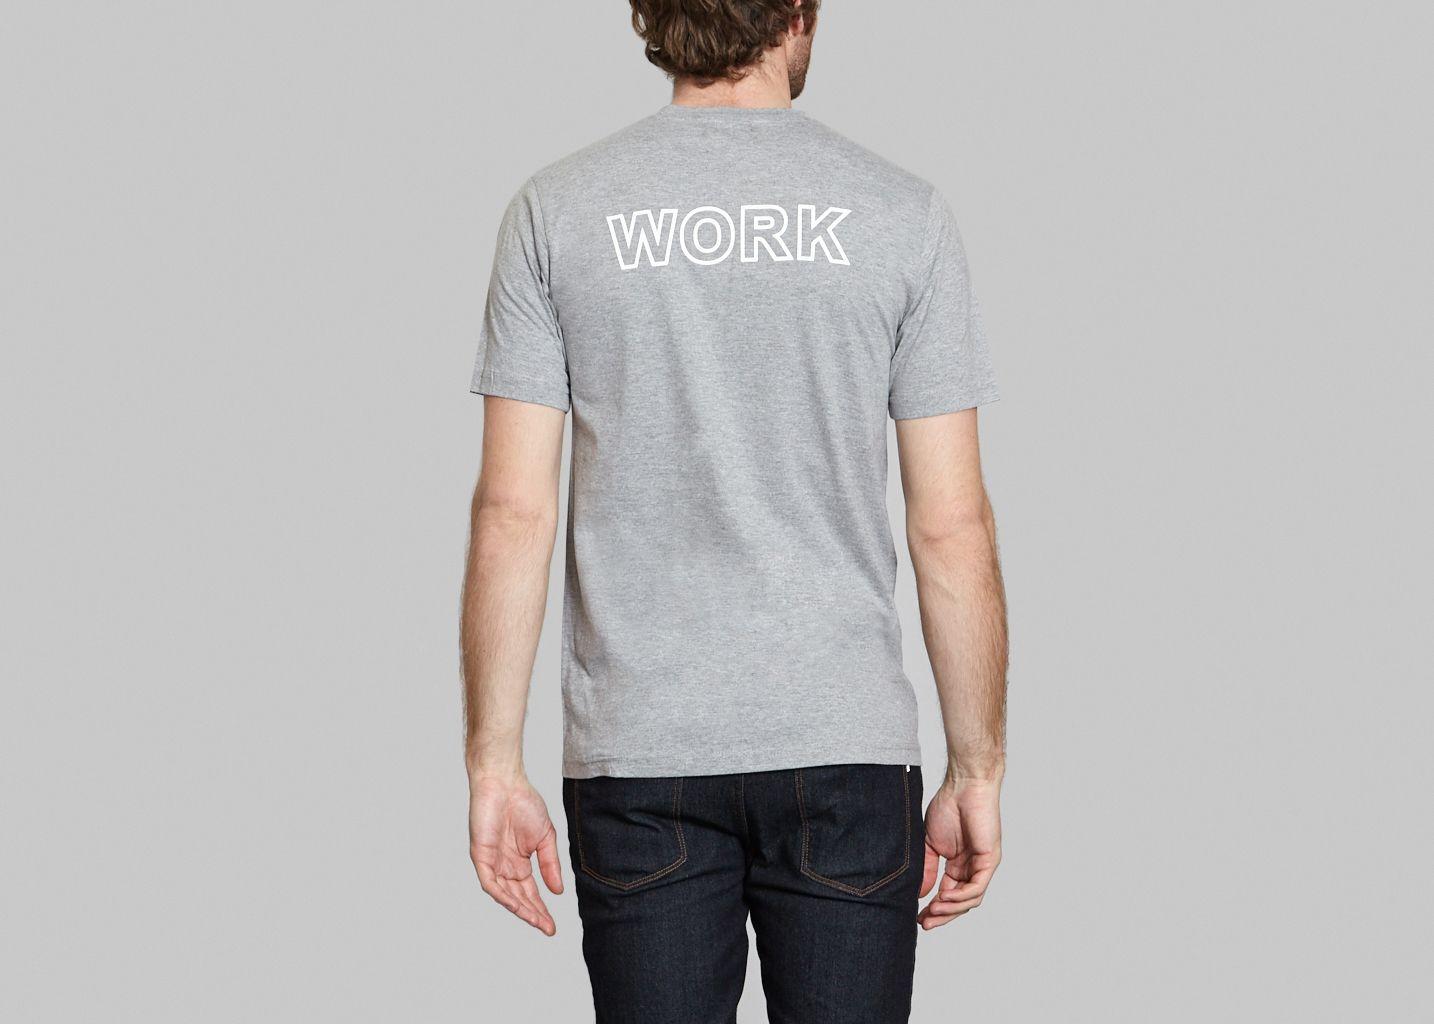 Tee-Shirt Work  - Andrea Crews